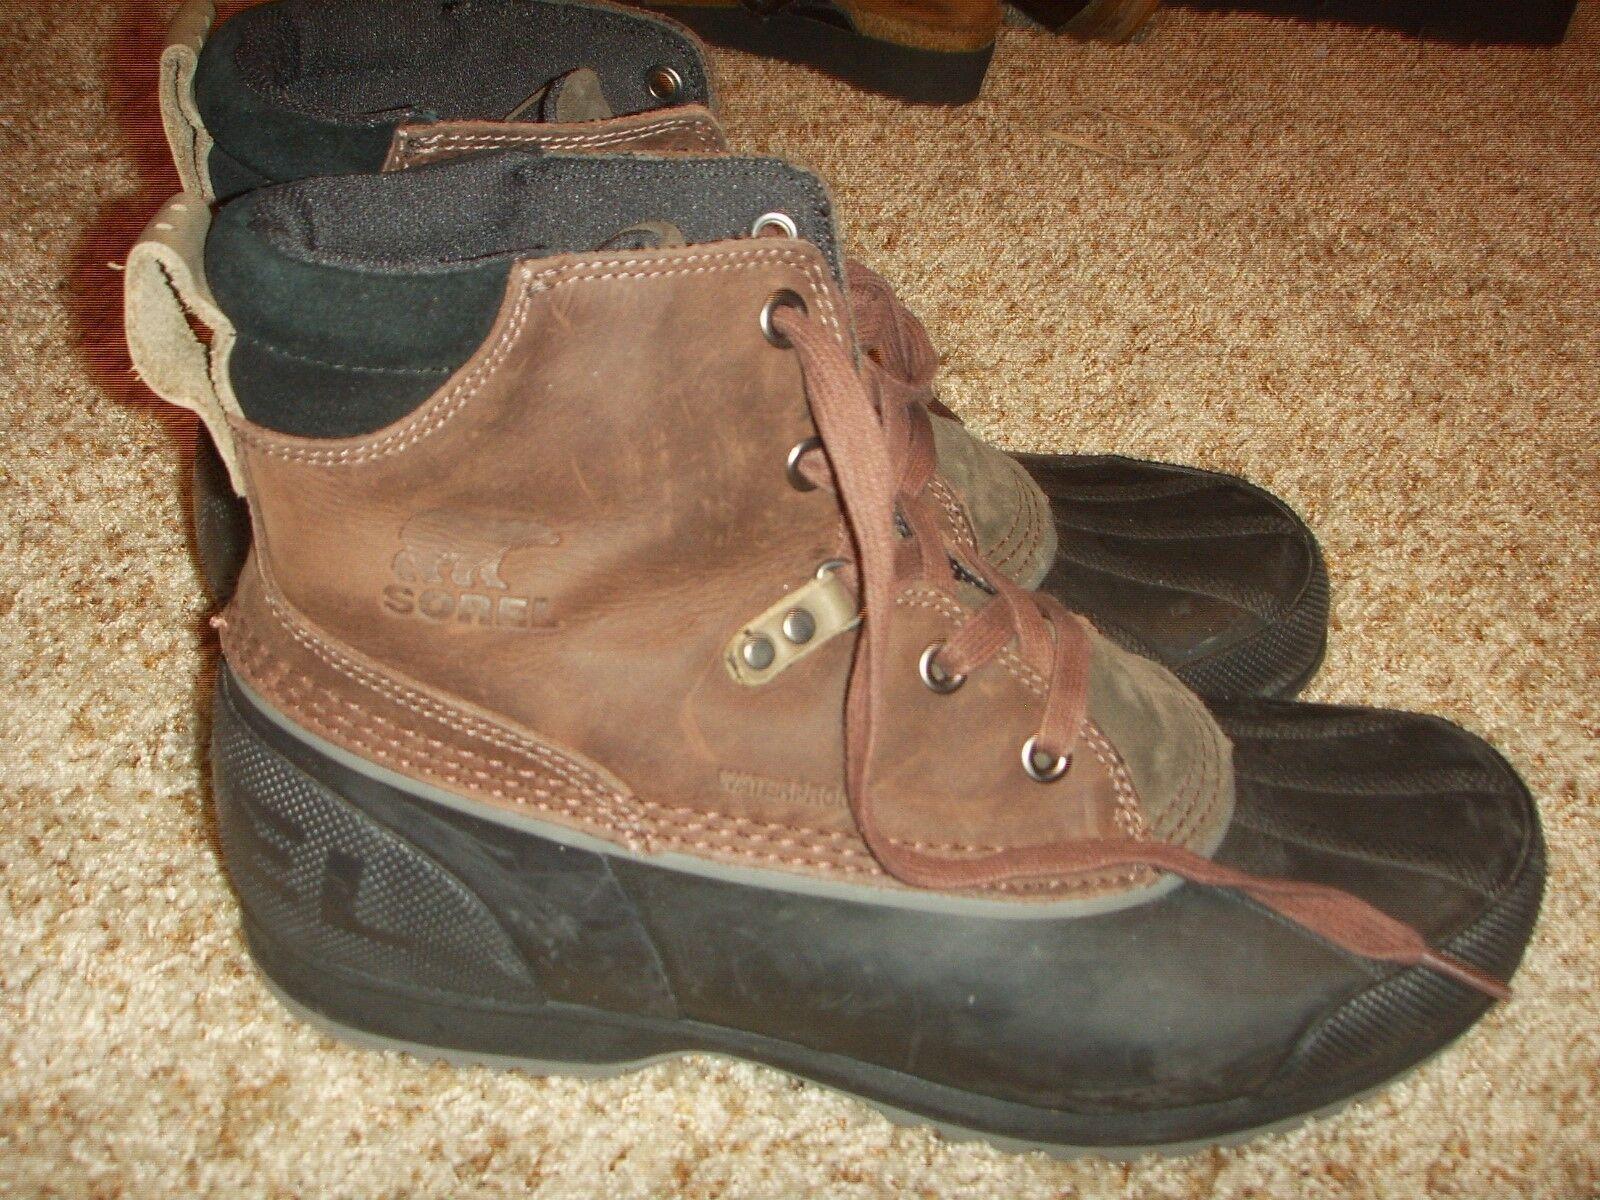 SOREL 1553381231 Ankeny Cordovan Madder brown waterproof Mens Size 9.5